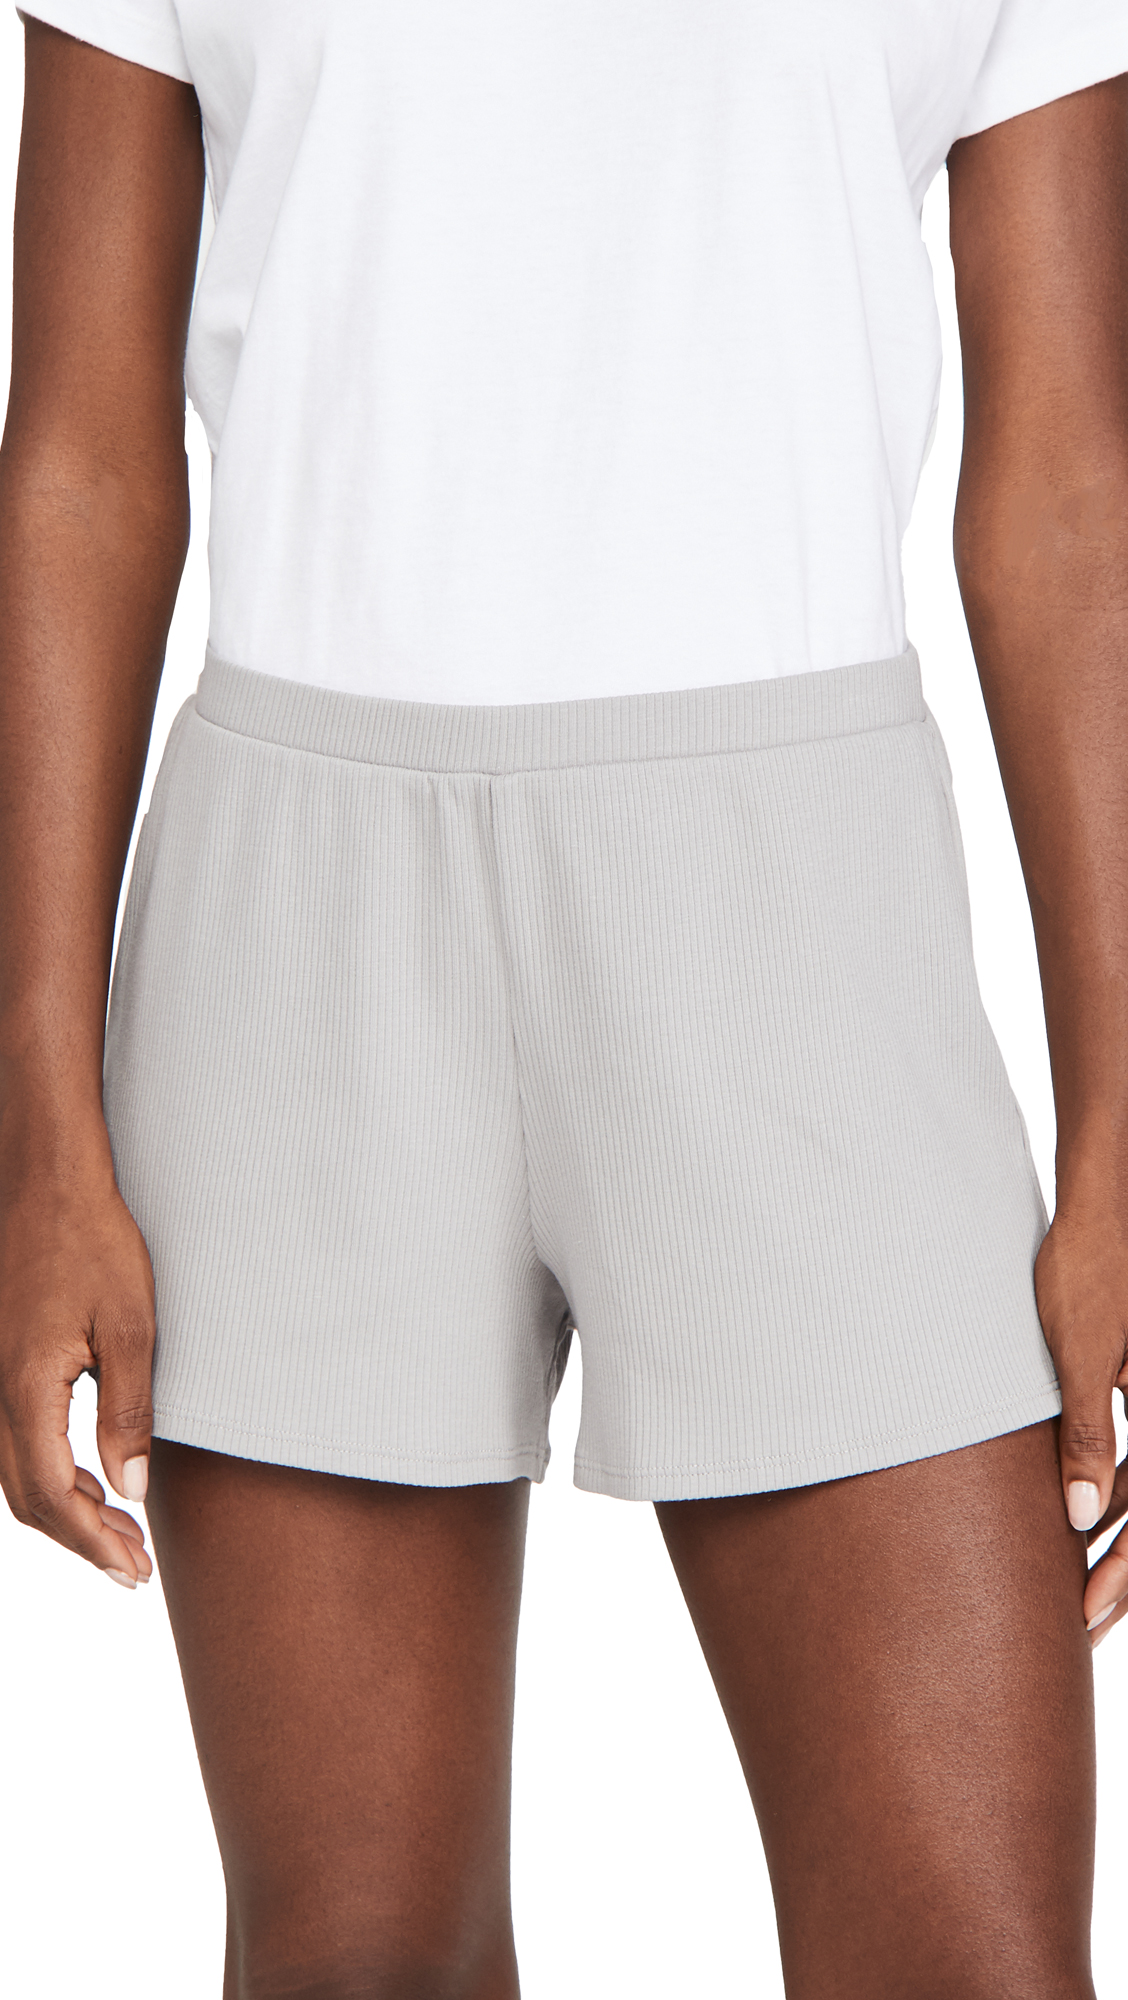 Skin Indigo Shortie Shorts